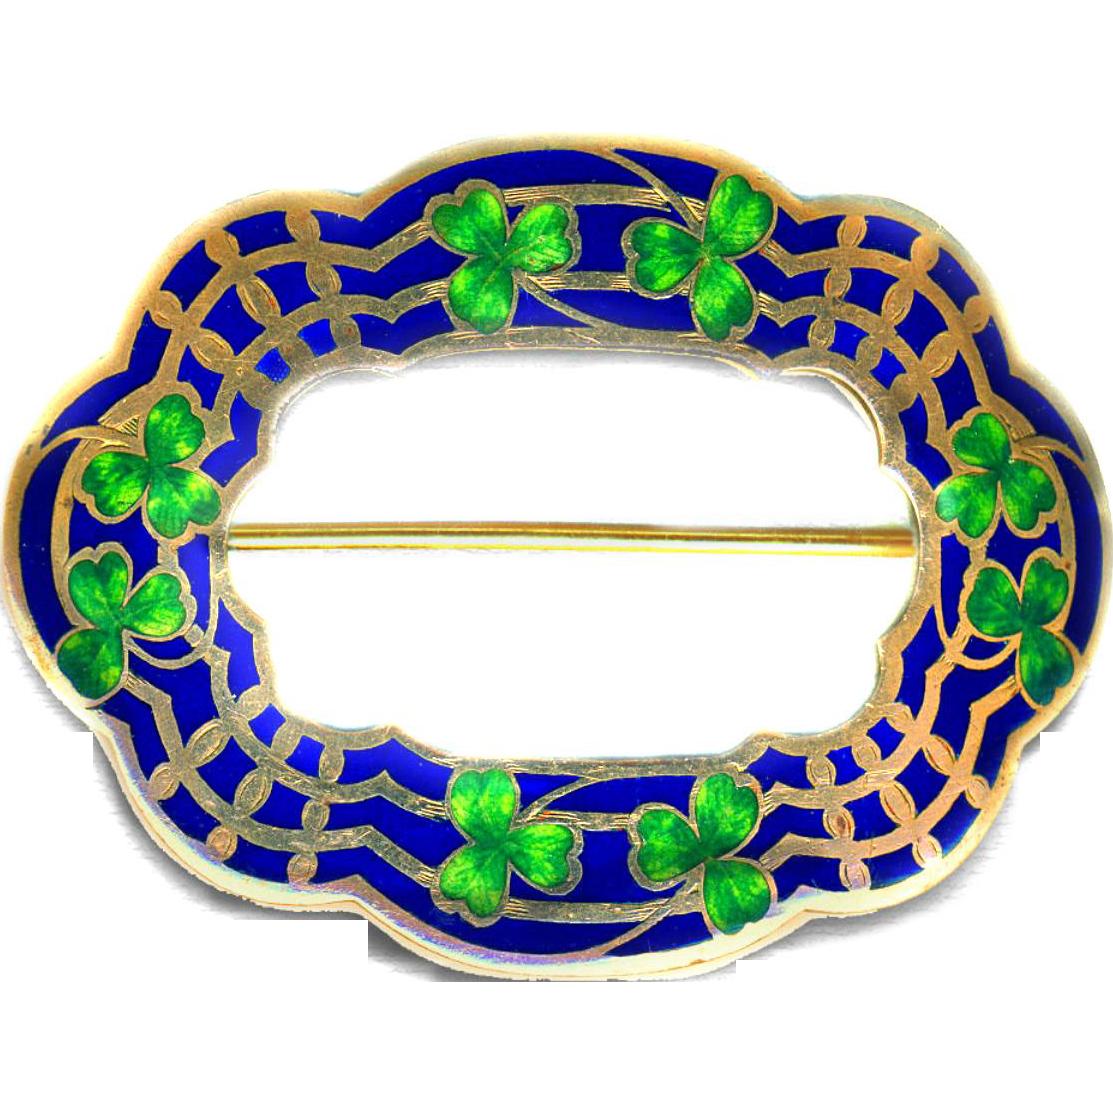 Brooch ~ Large Perfect Hand Painted Enamel Irish Shamrocks on Cobalt Champleve Enamel